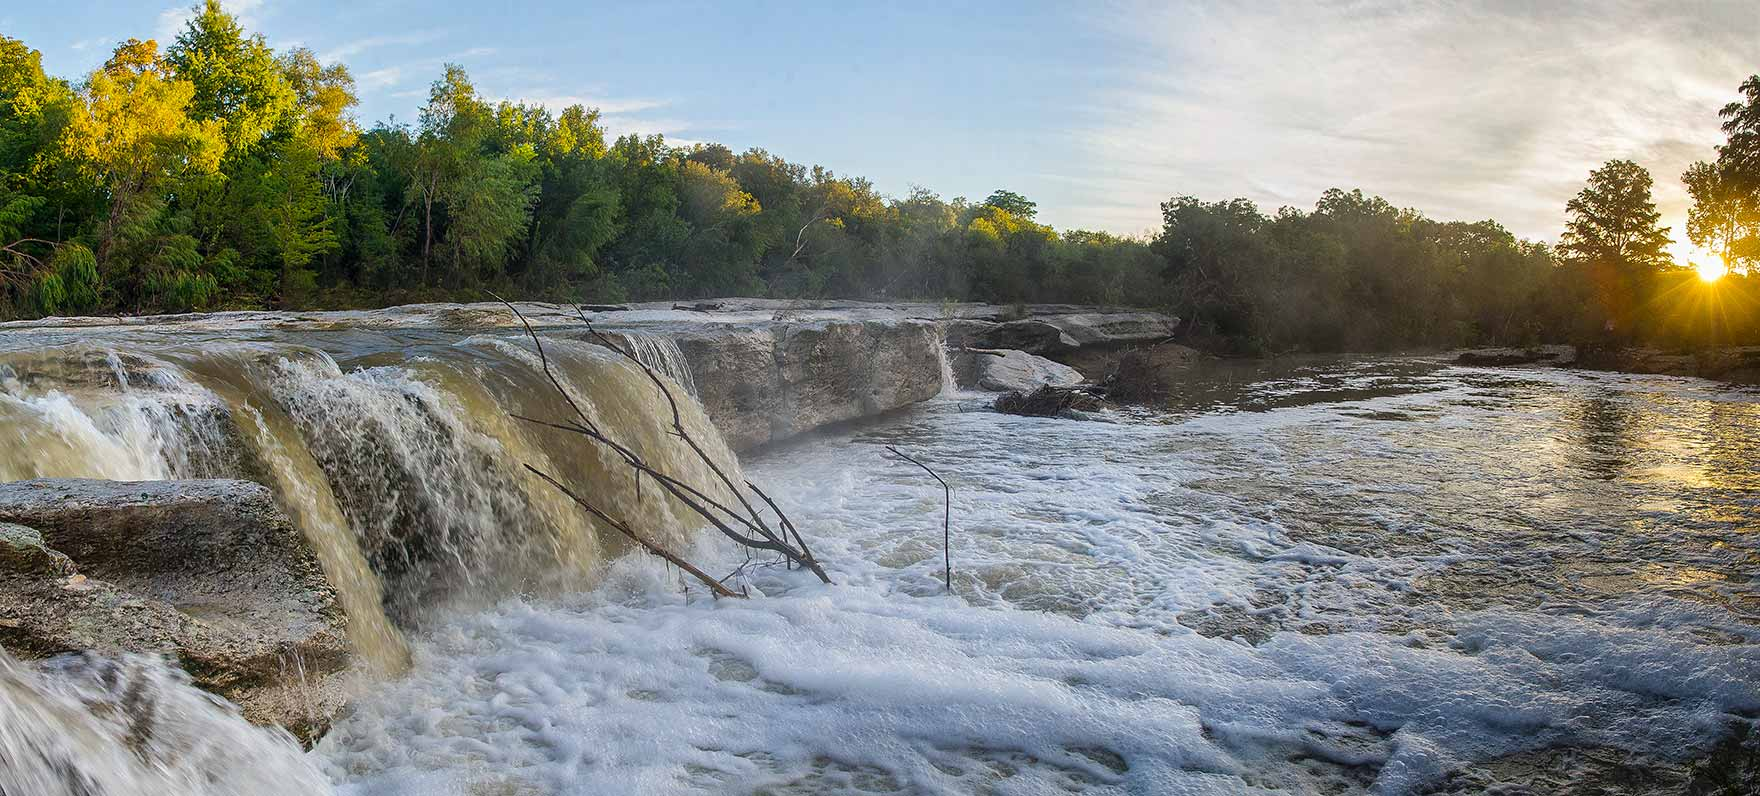 Take Shelter Off The Beaten Path At Mckinney Falls